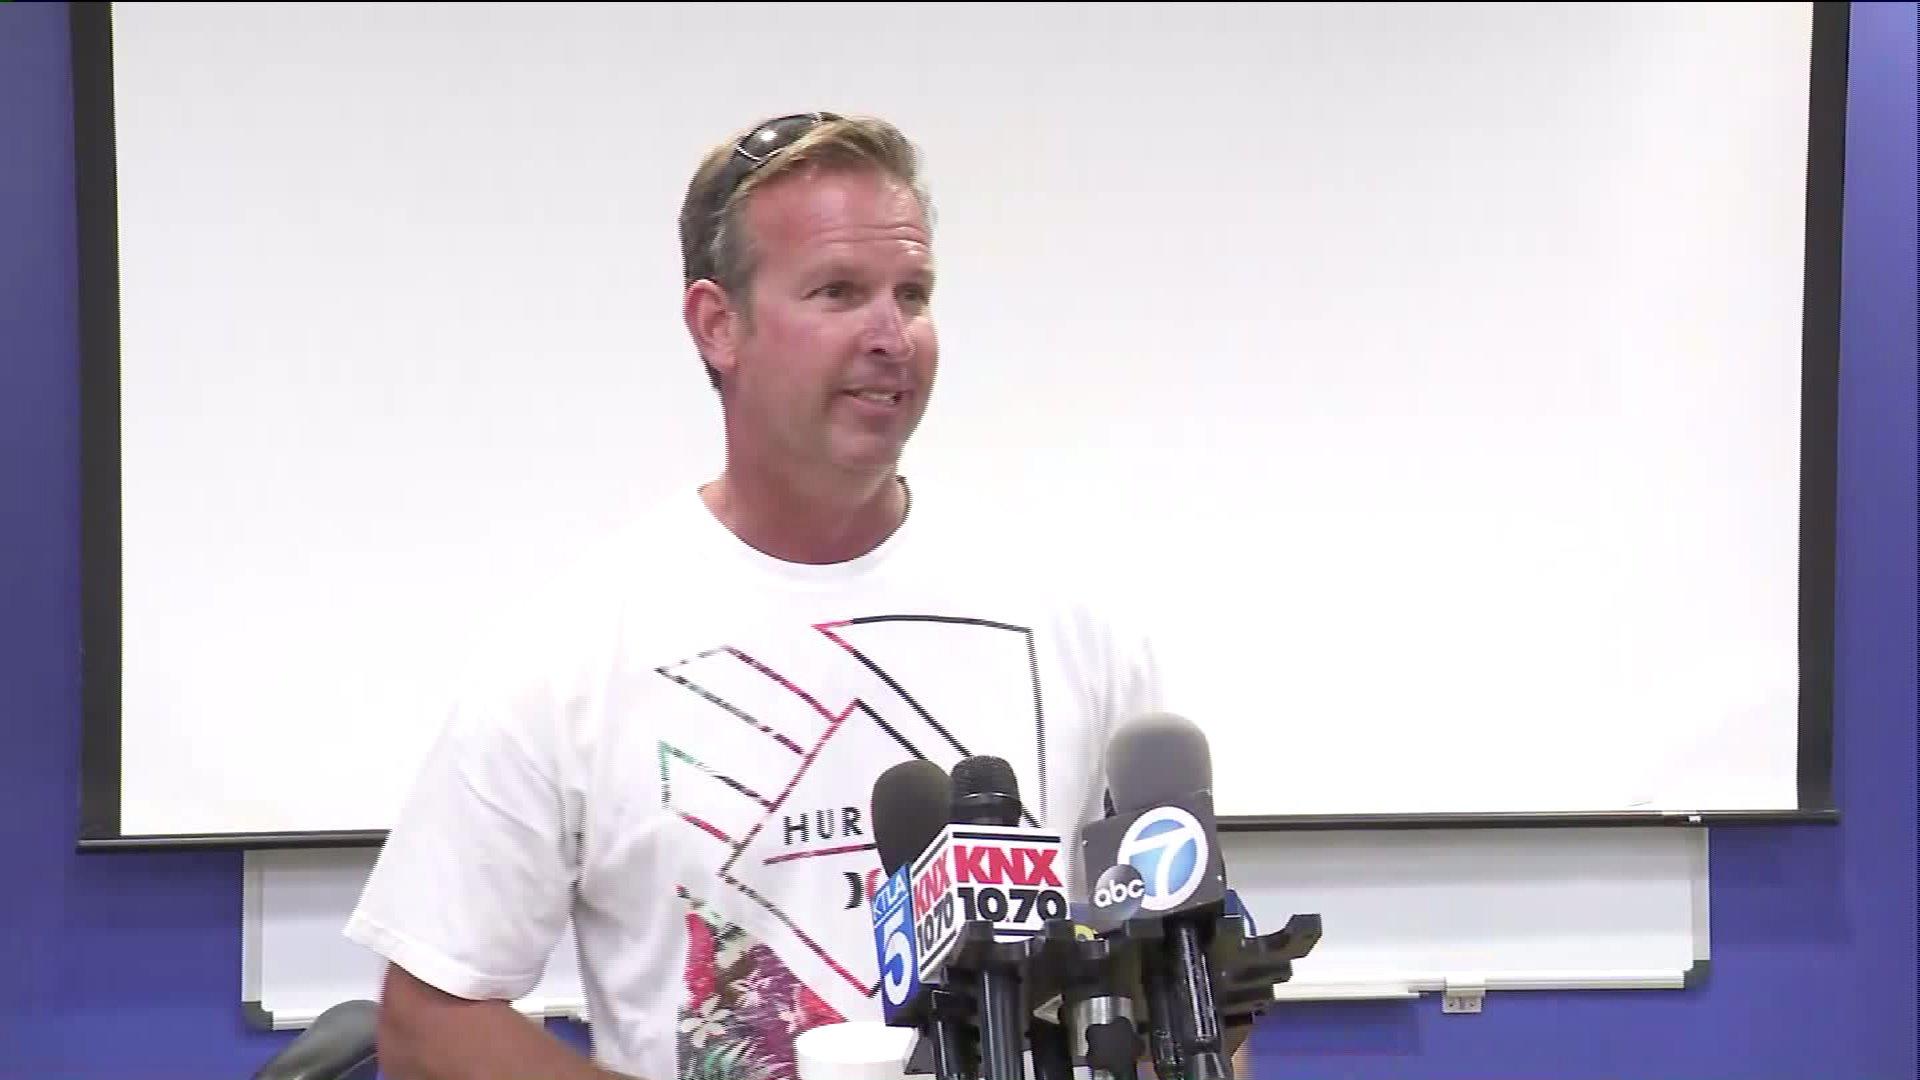 John Meffert is shown in an image from a press conference on June 30, 2017. (Credit: KTLA)